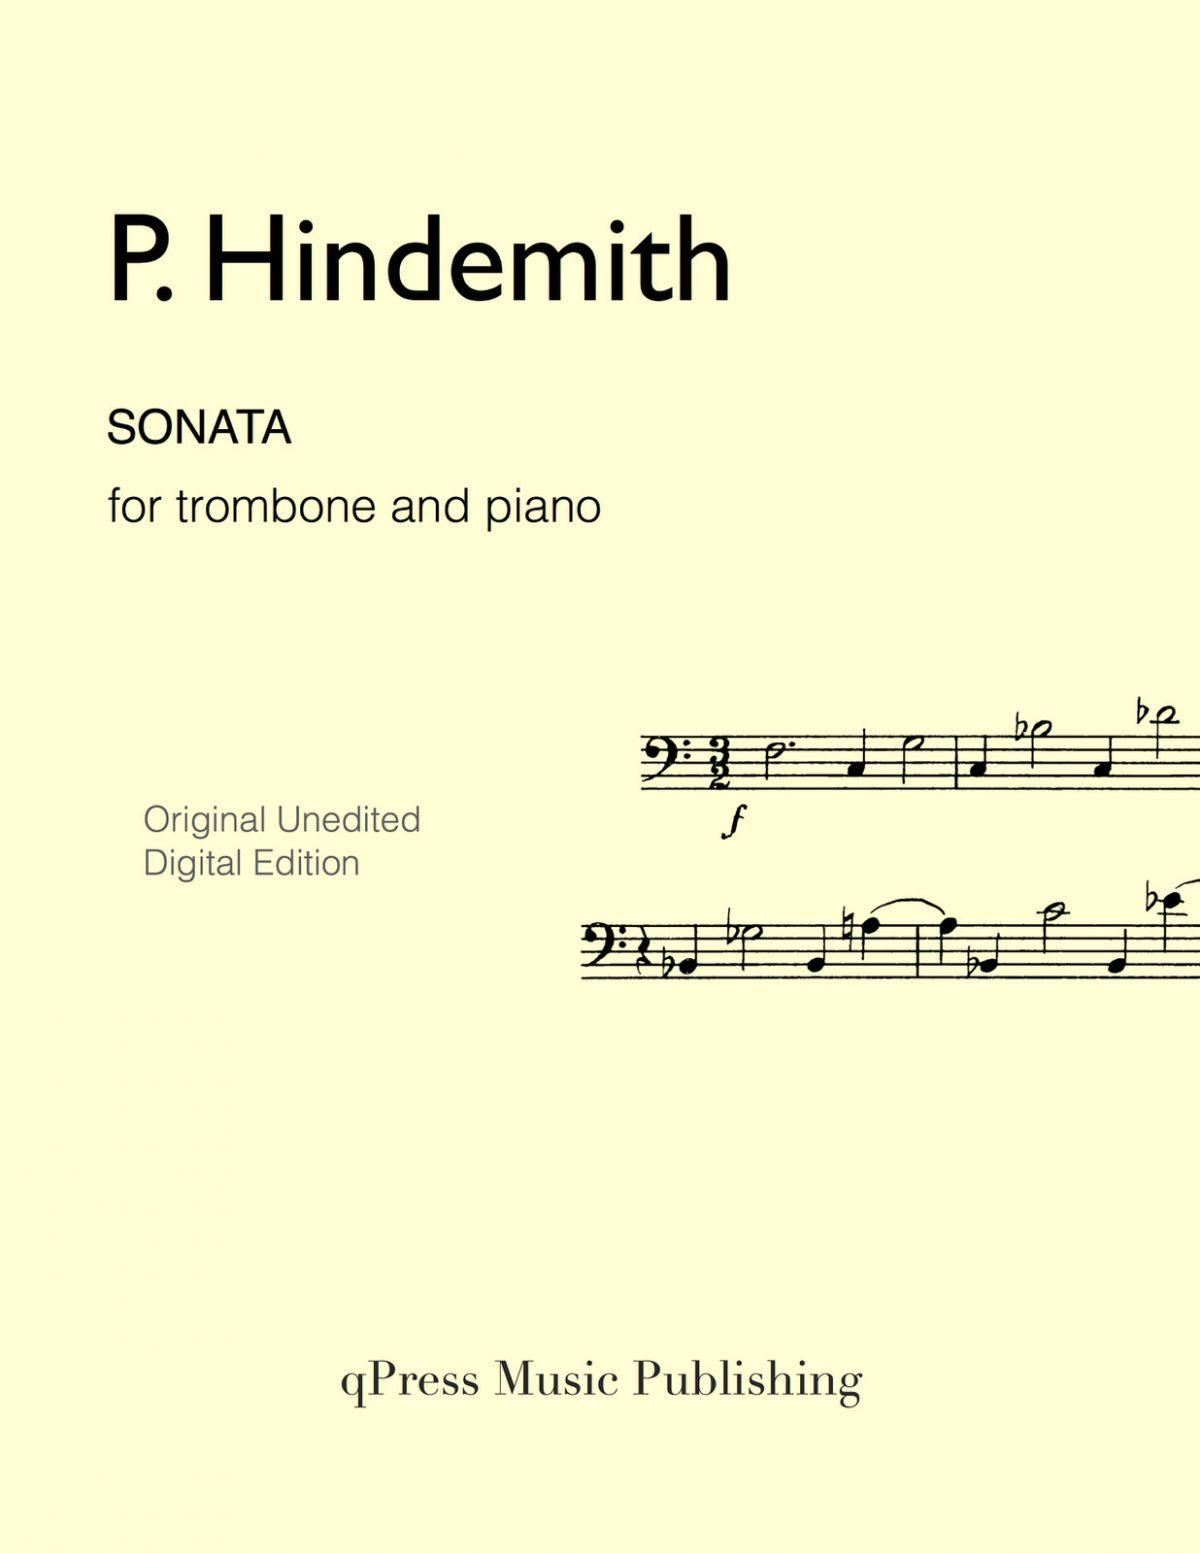 hindemith-sonata-for-trombone-complete